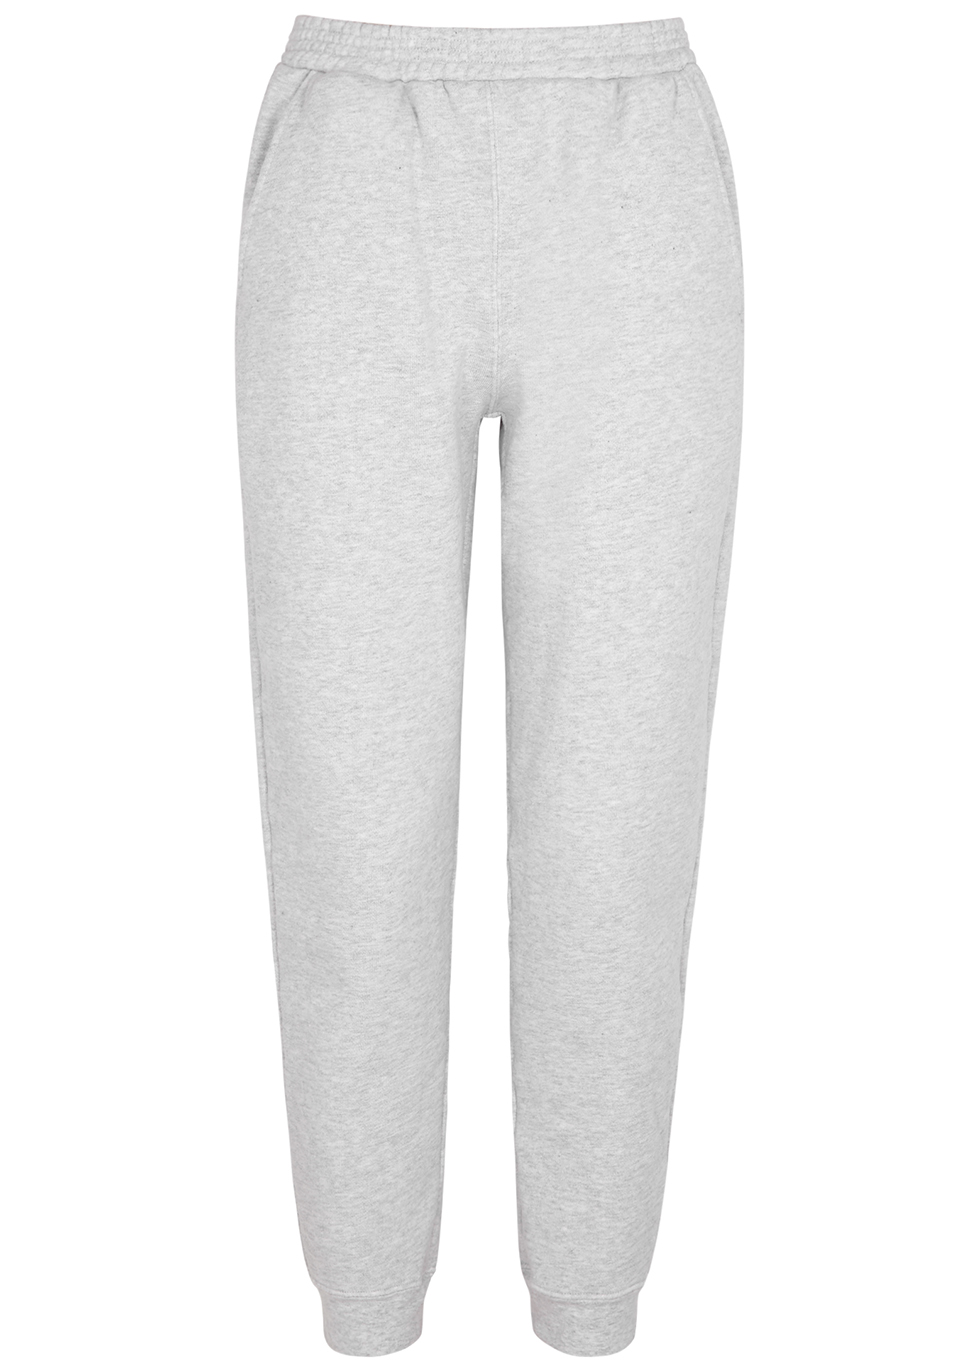 Baetown grey mélange jersey sweatpants